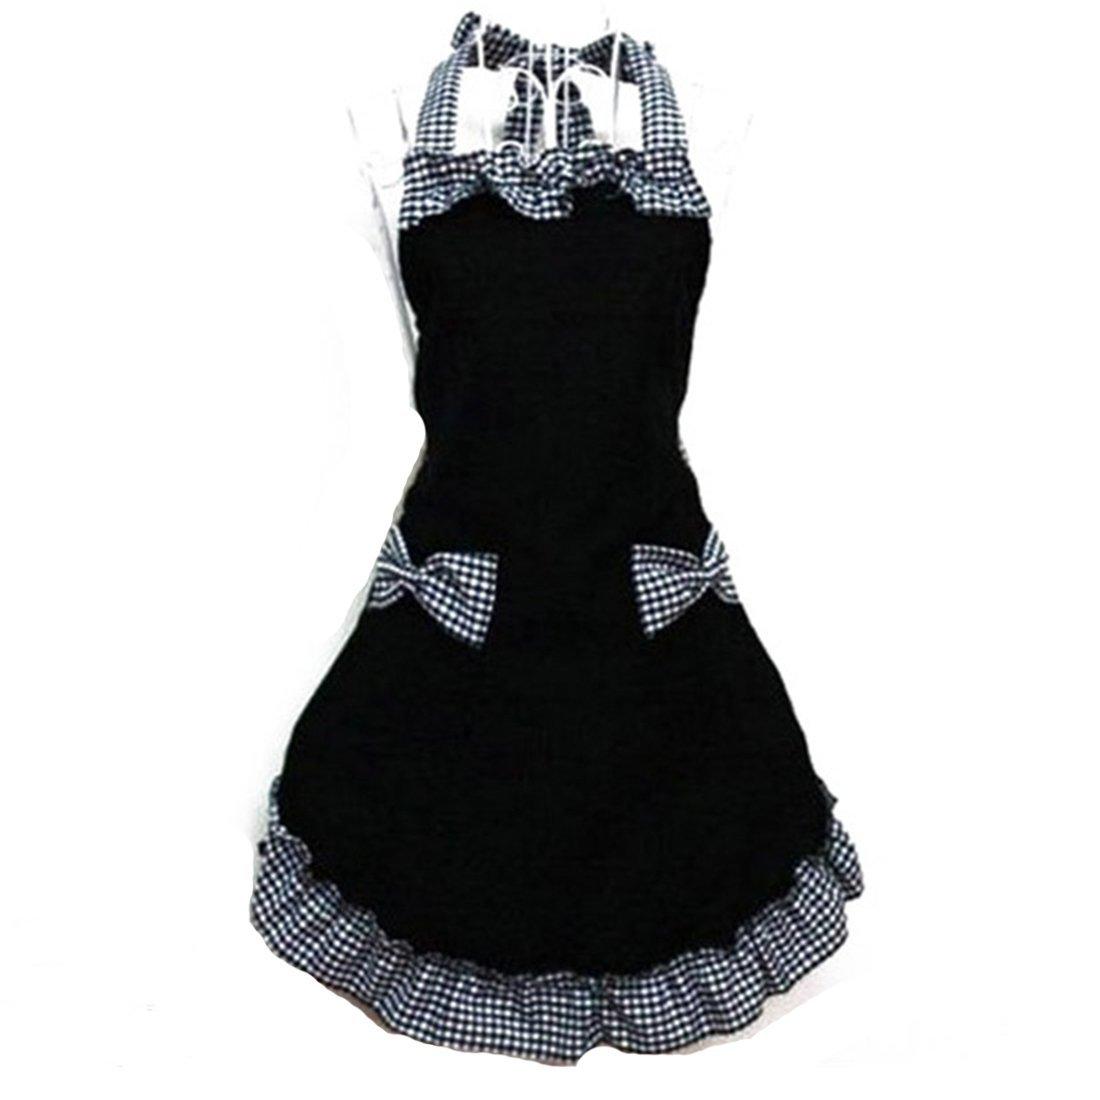 New 2016 Cute Bib Apron Dress Flirty Vintage Kitchen Women Bowknot With Pocket Gift 0